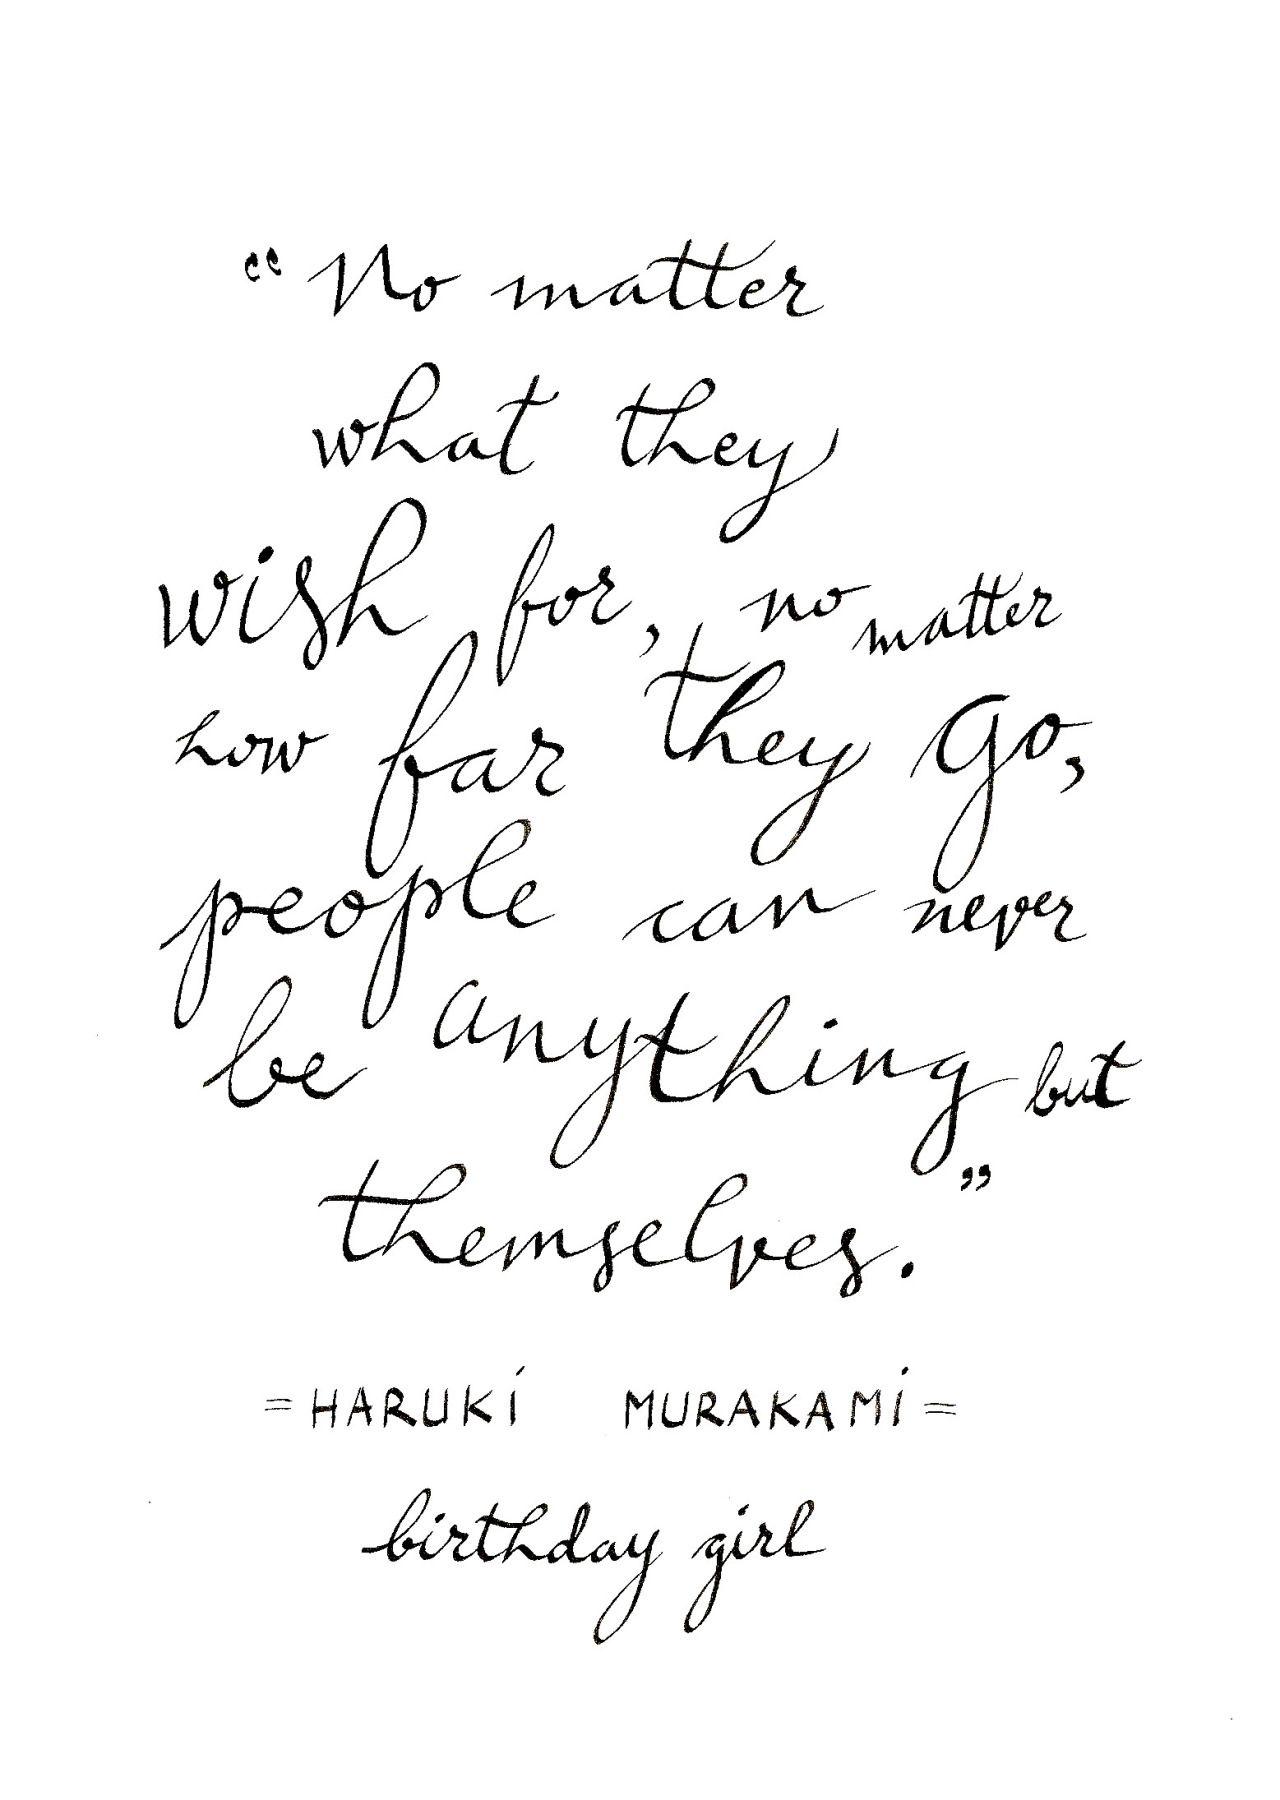 Readitbook Murakami Quotes Murakami Haruki Murakami